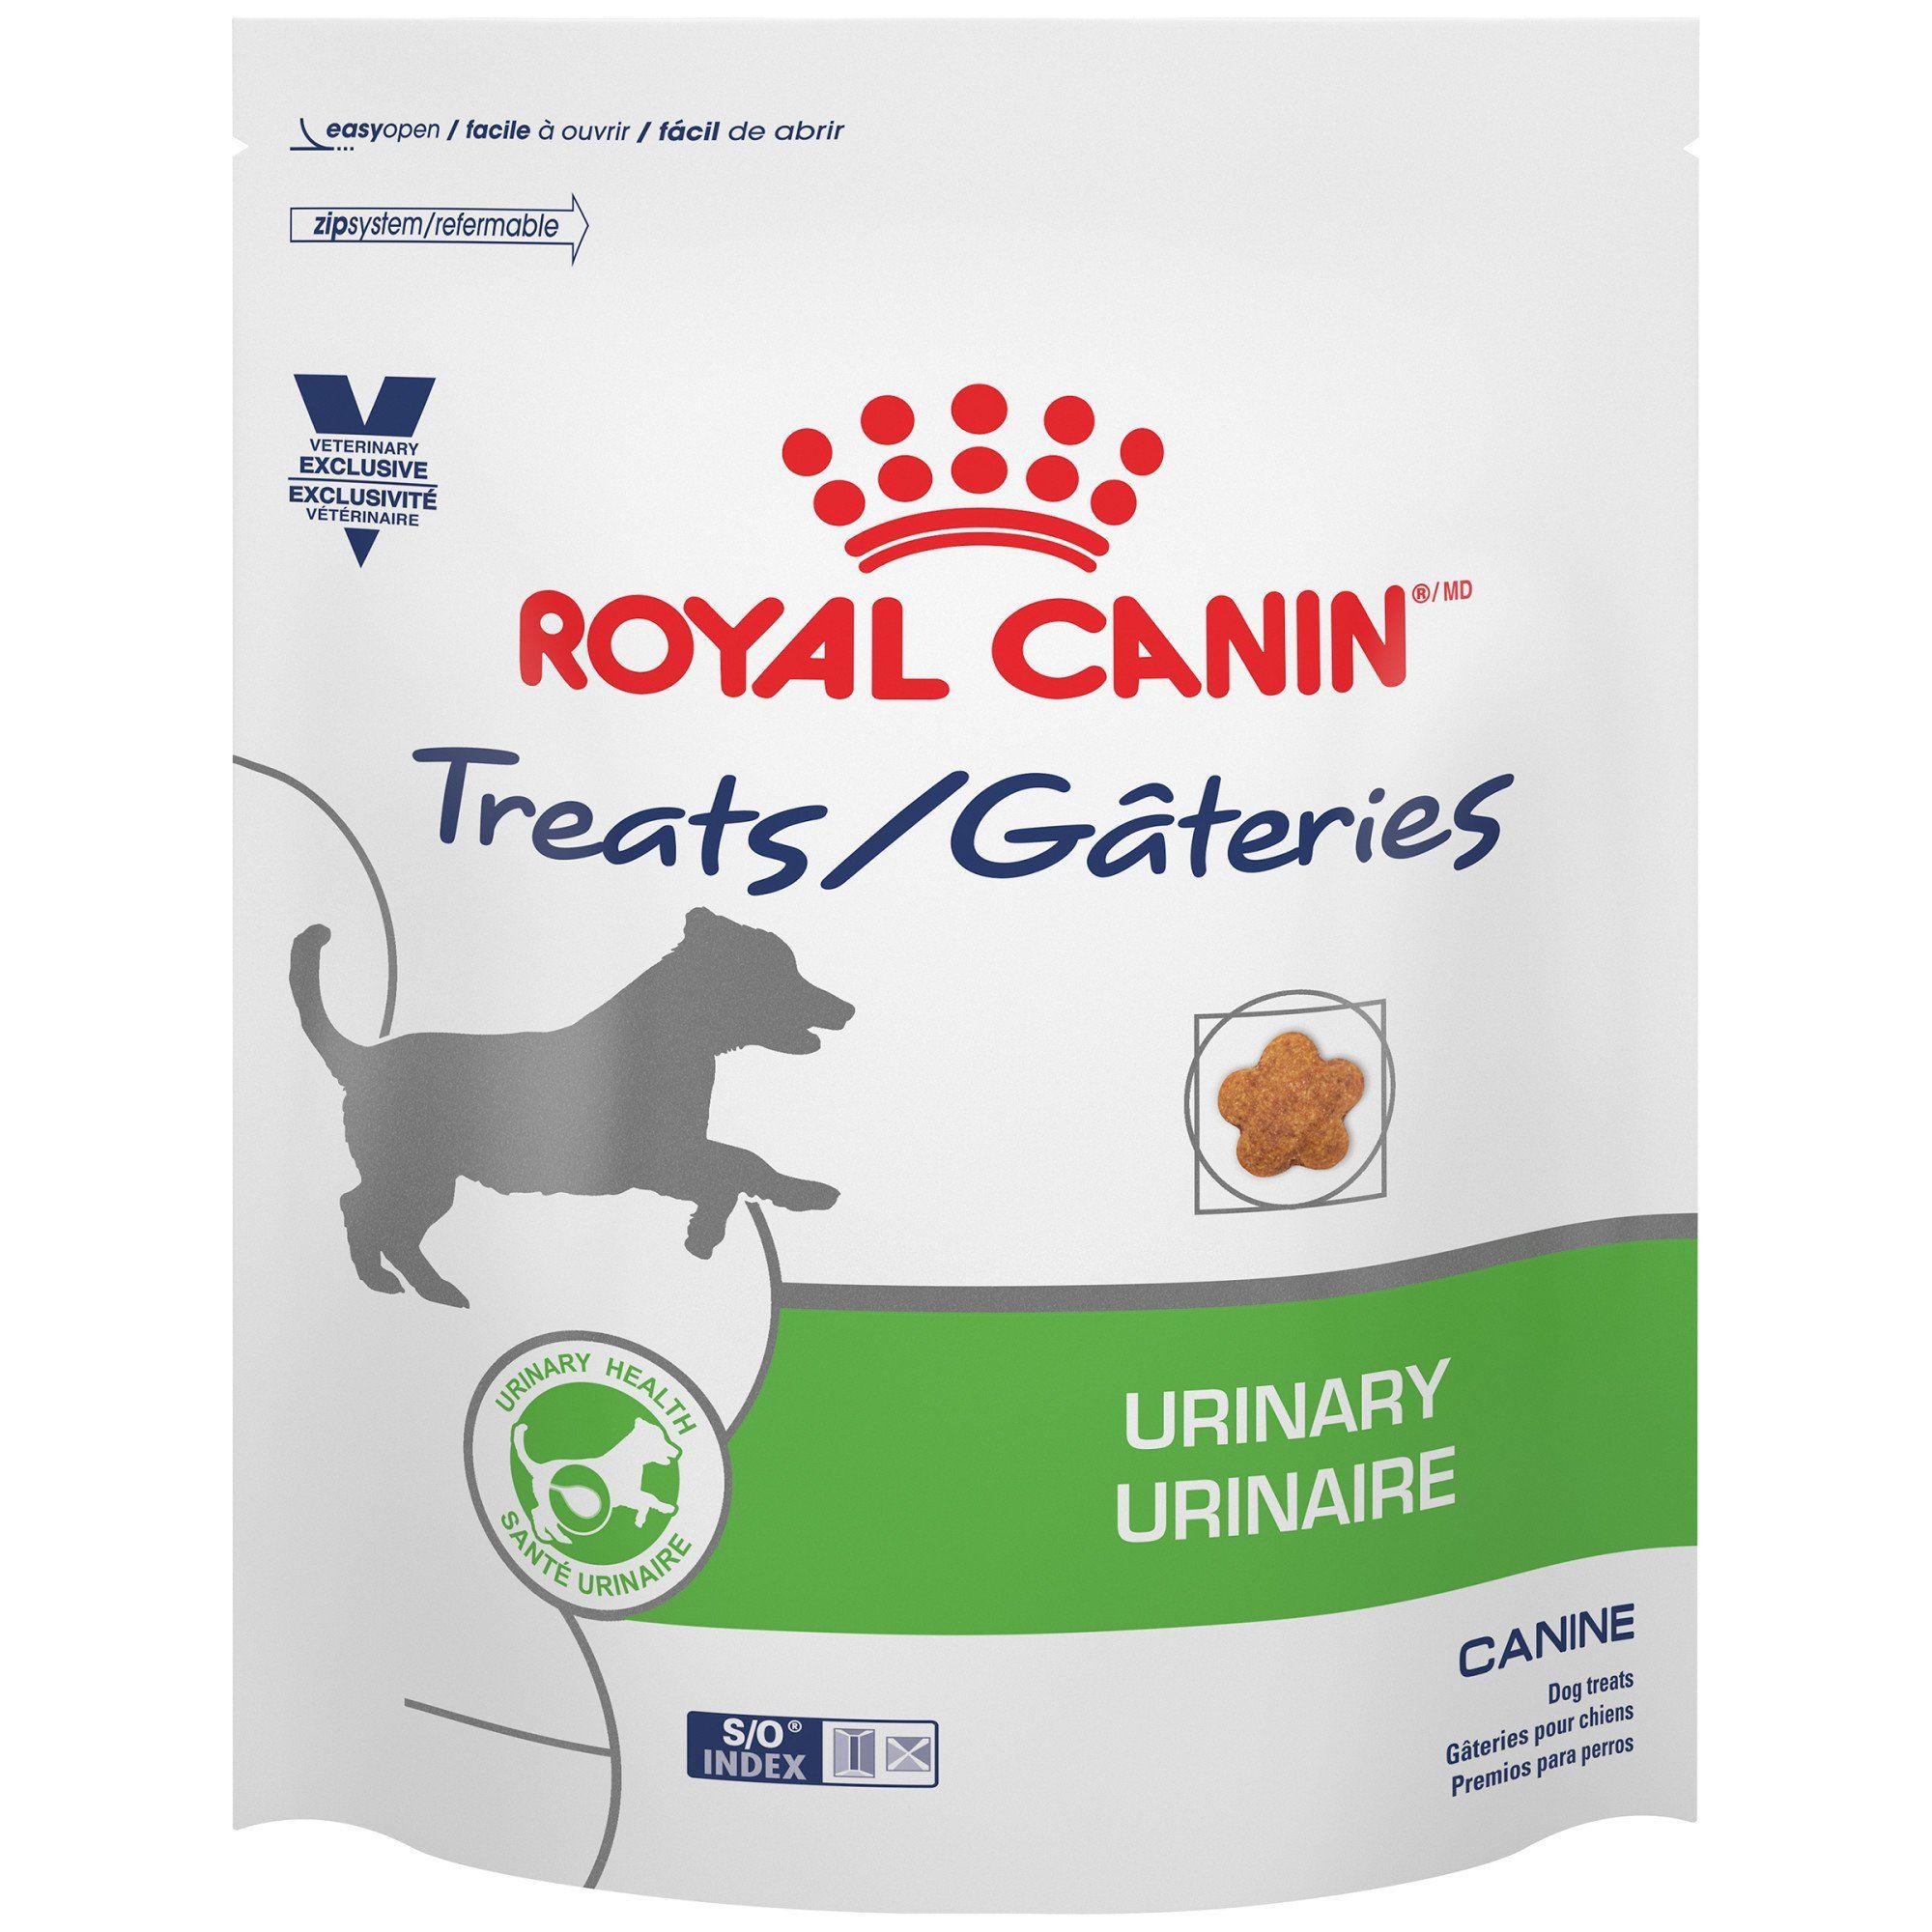 Royal Canin Urinary Canine Treats 17 6 Oz Best Treats For Dogs